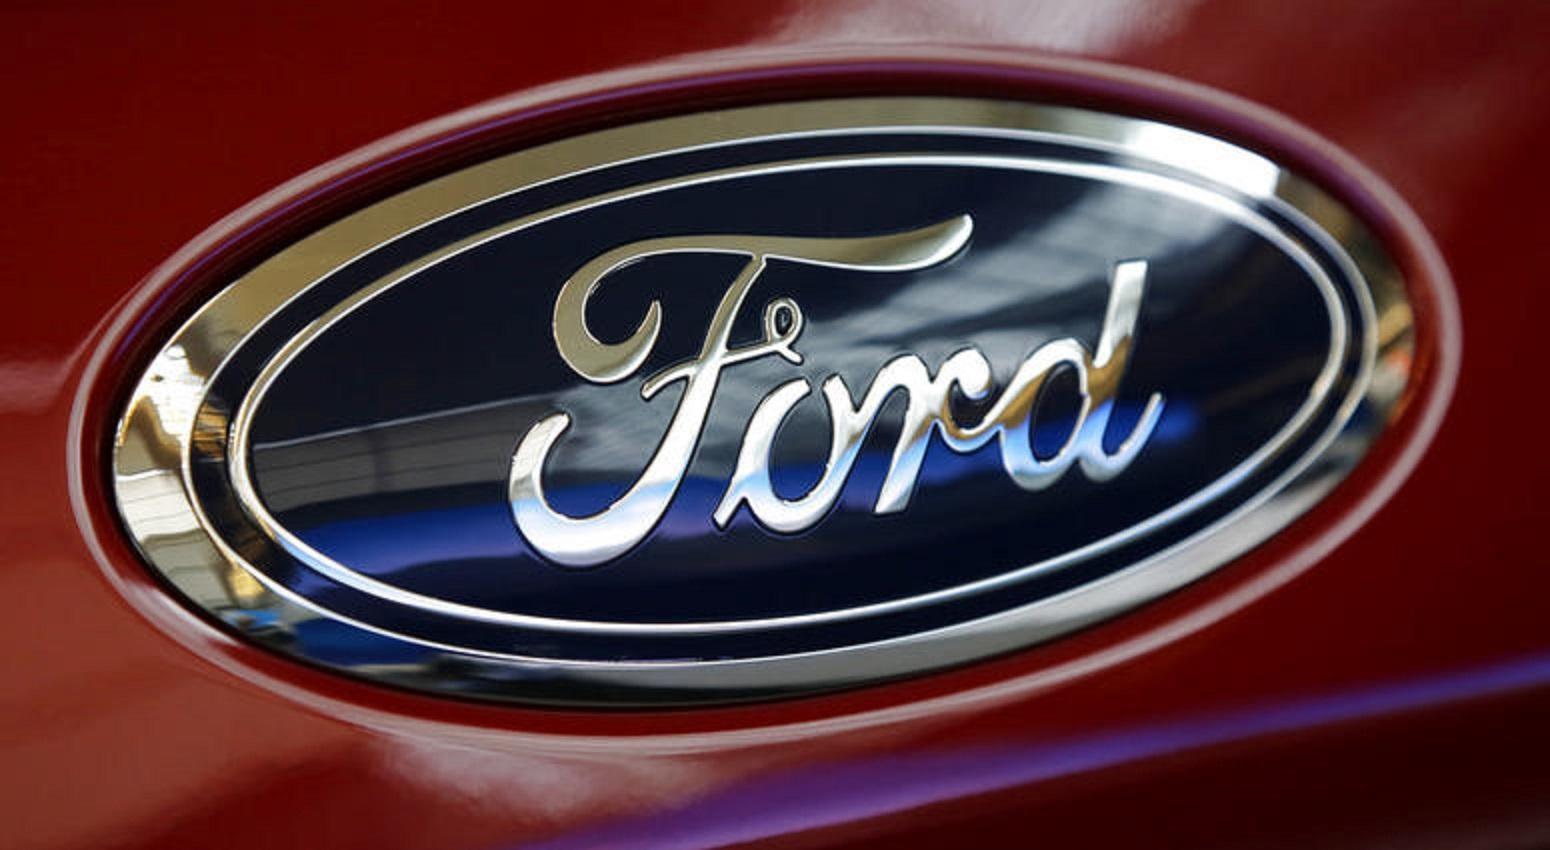 Ford,triệu hồi,thu hồi,xe Ford lỗi,thu hồi xe Ford